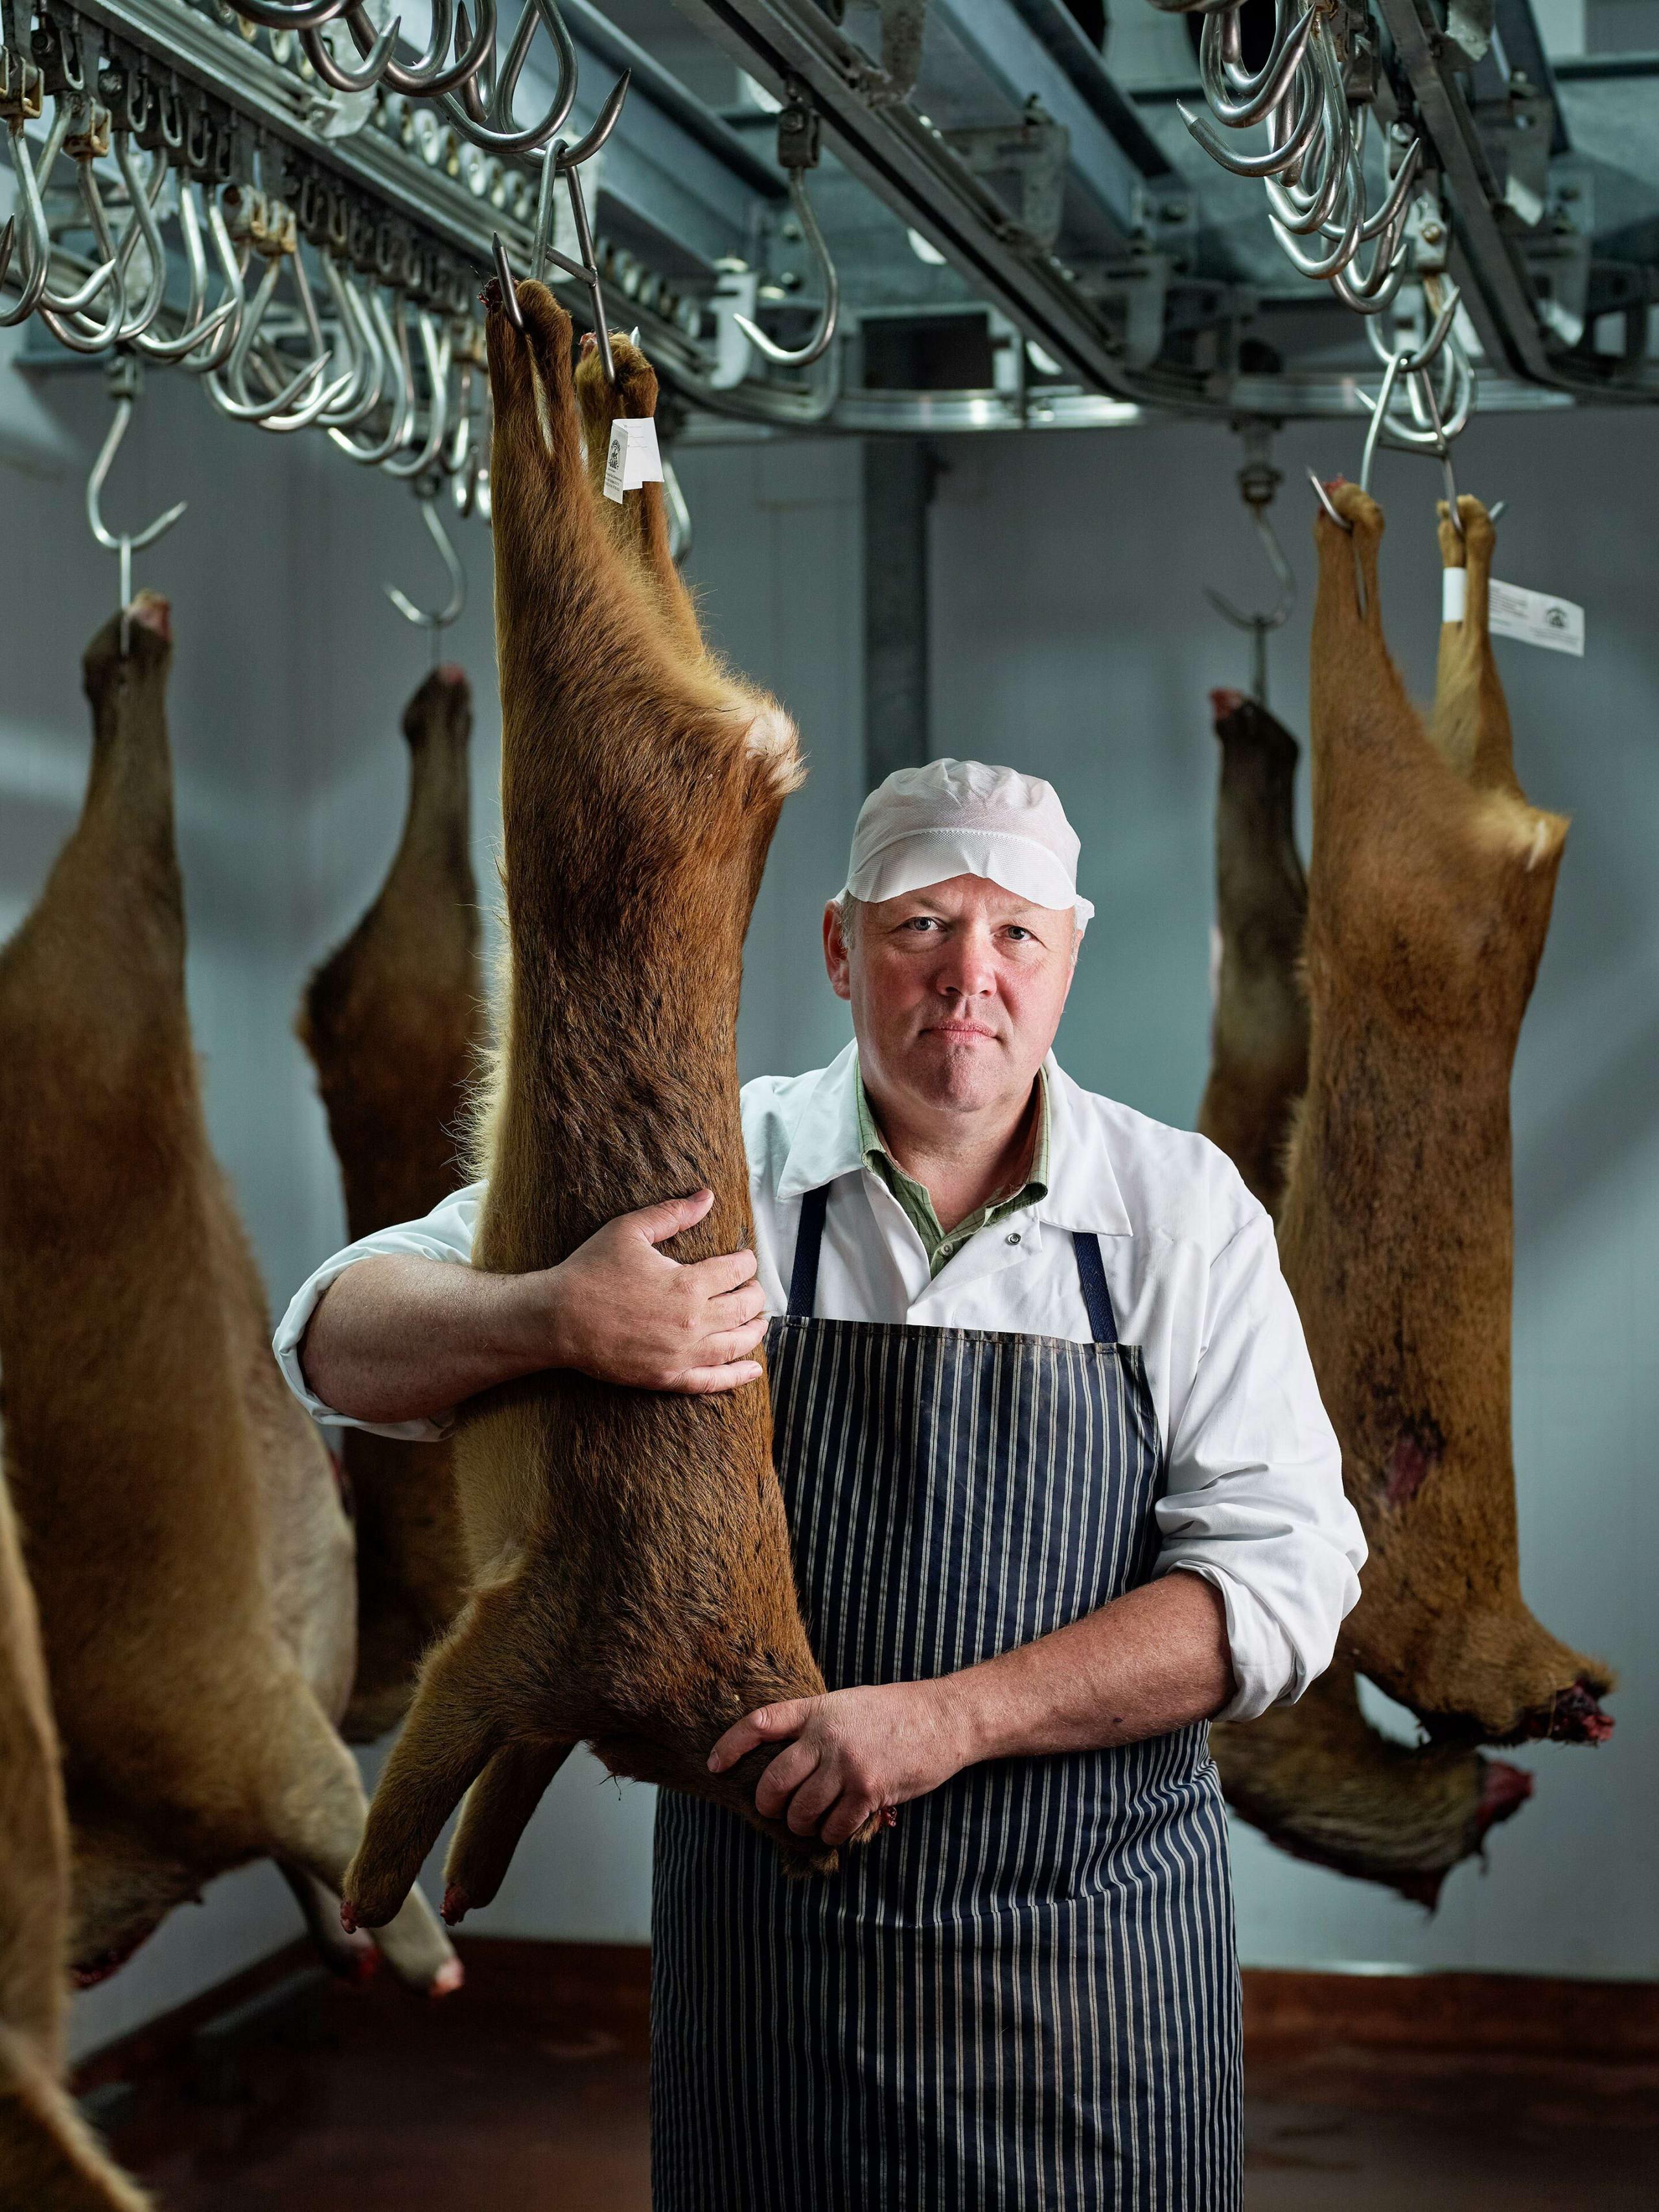 Richard Moran Food Producers portraits lifestyle 001